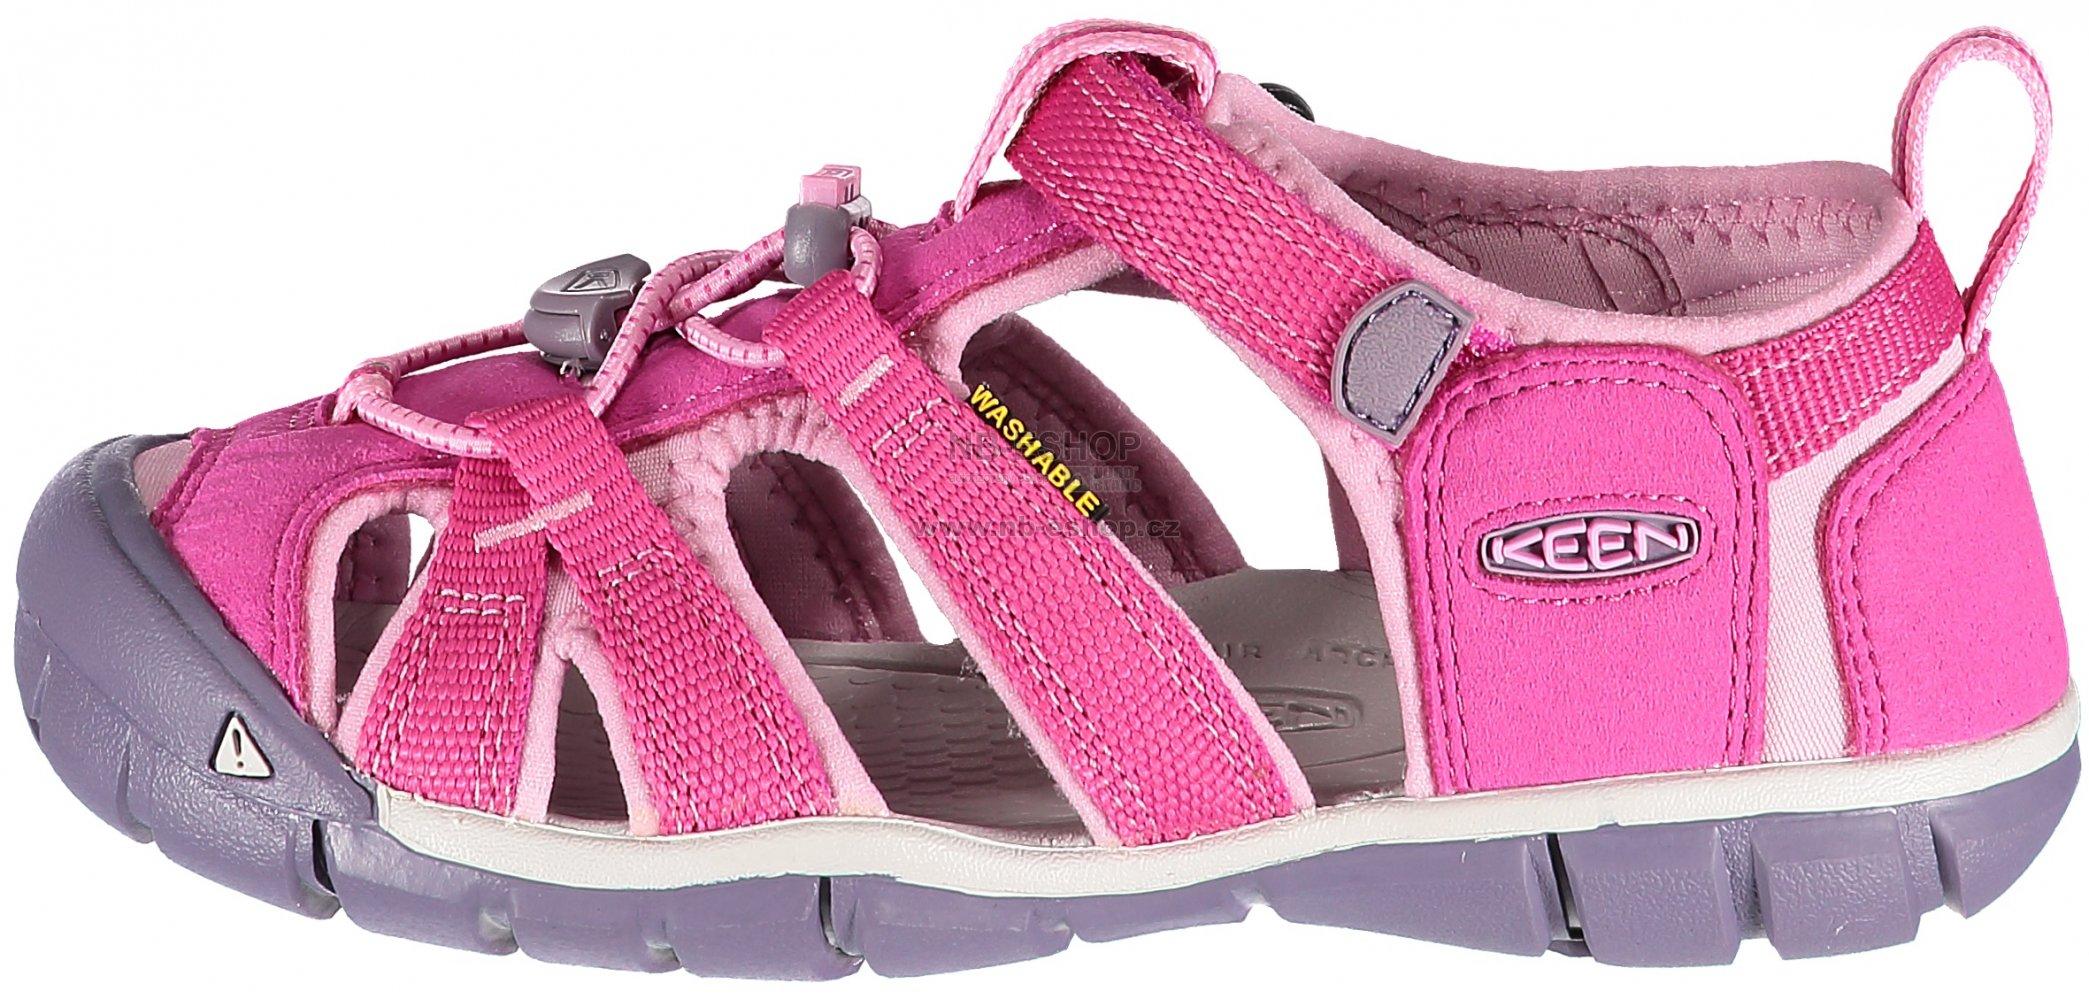 28cfcccbb2f Dětské sandály KEEN SEACAMP II CNX JR VERY BERRY LILAC CHIFFO ...